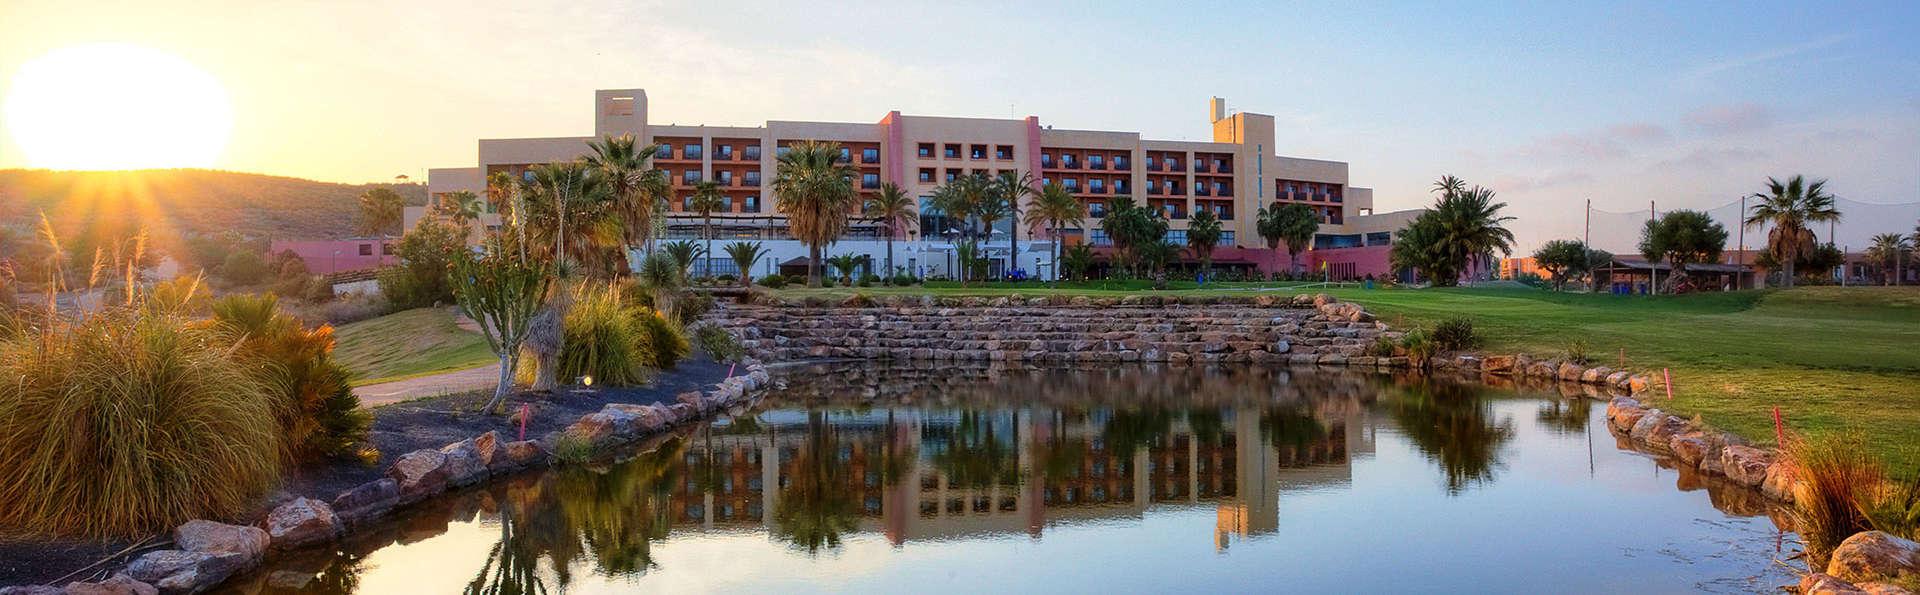 Hotel Valle del Este Golf Resort - Edit_front3.jpg